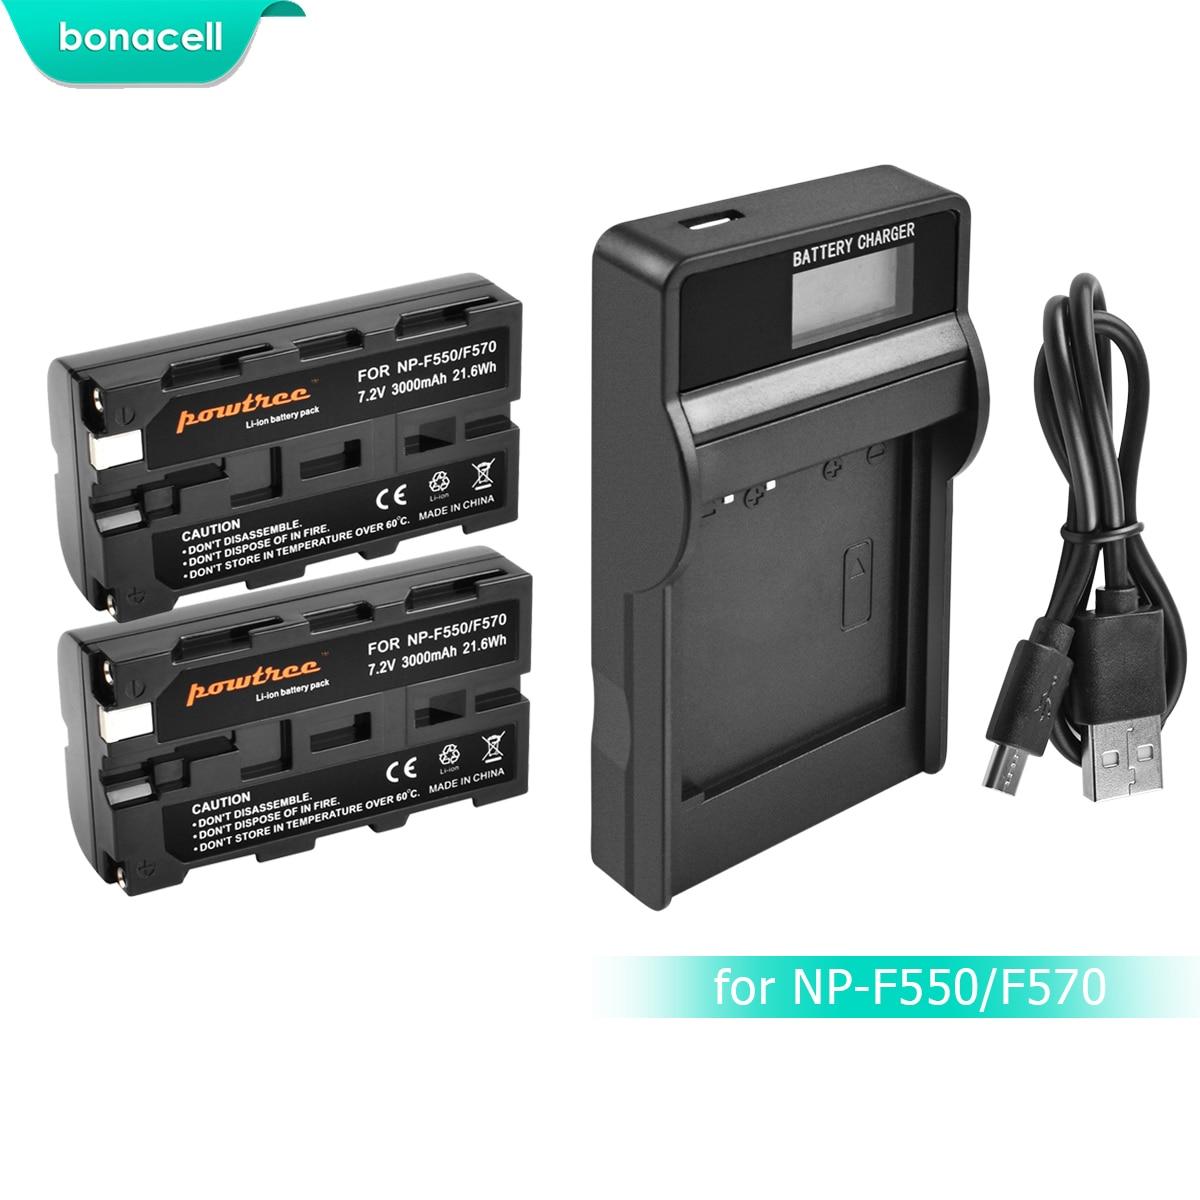 Bonacell 3000 mah NP-F550 NP F550 NPF550 Batterie + LCD Chargeur pour Sony NP-F330 NP-F530 NP-F570 NP-F730 NP-F750 Salut- 8 GV-D200 L10